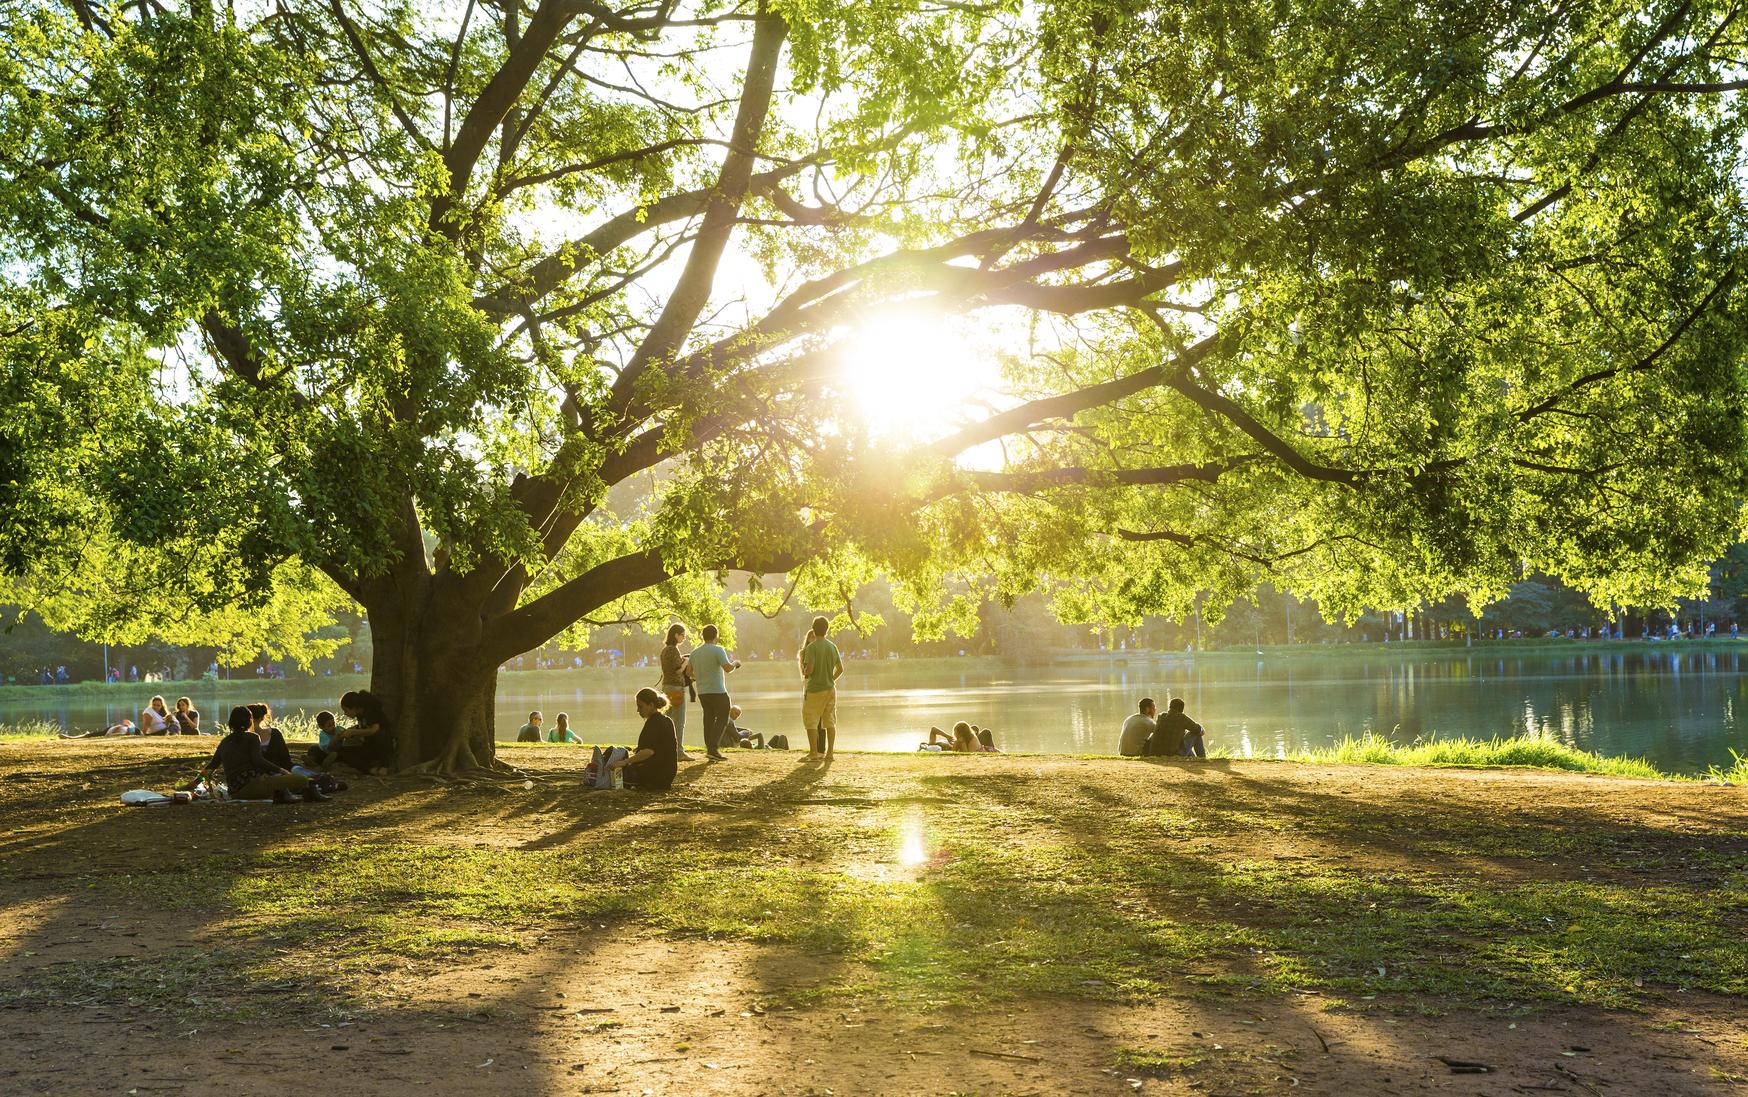 Sao Paulo, Brazil - August 3, 2014: People enjoying a beautiful day in Ibirapuera Park in Sao Paulo, Brazil